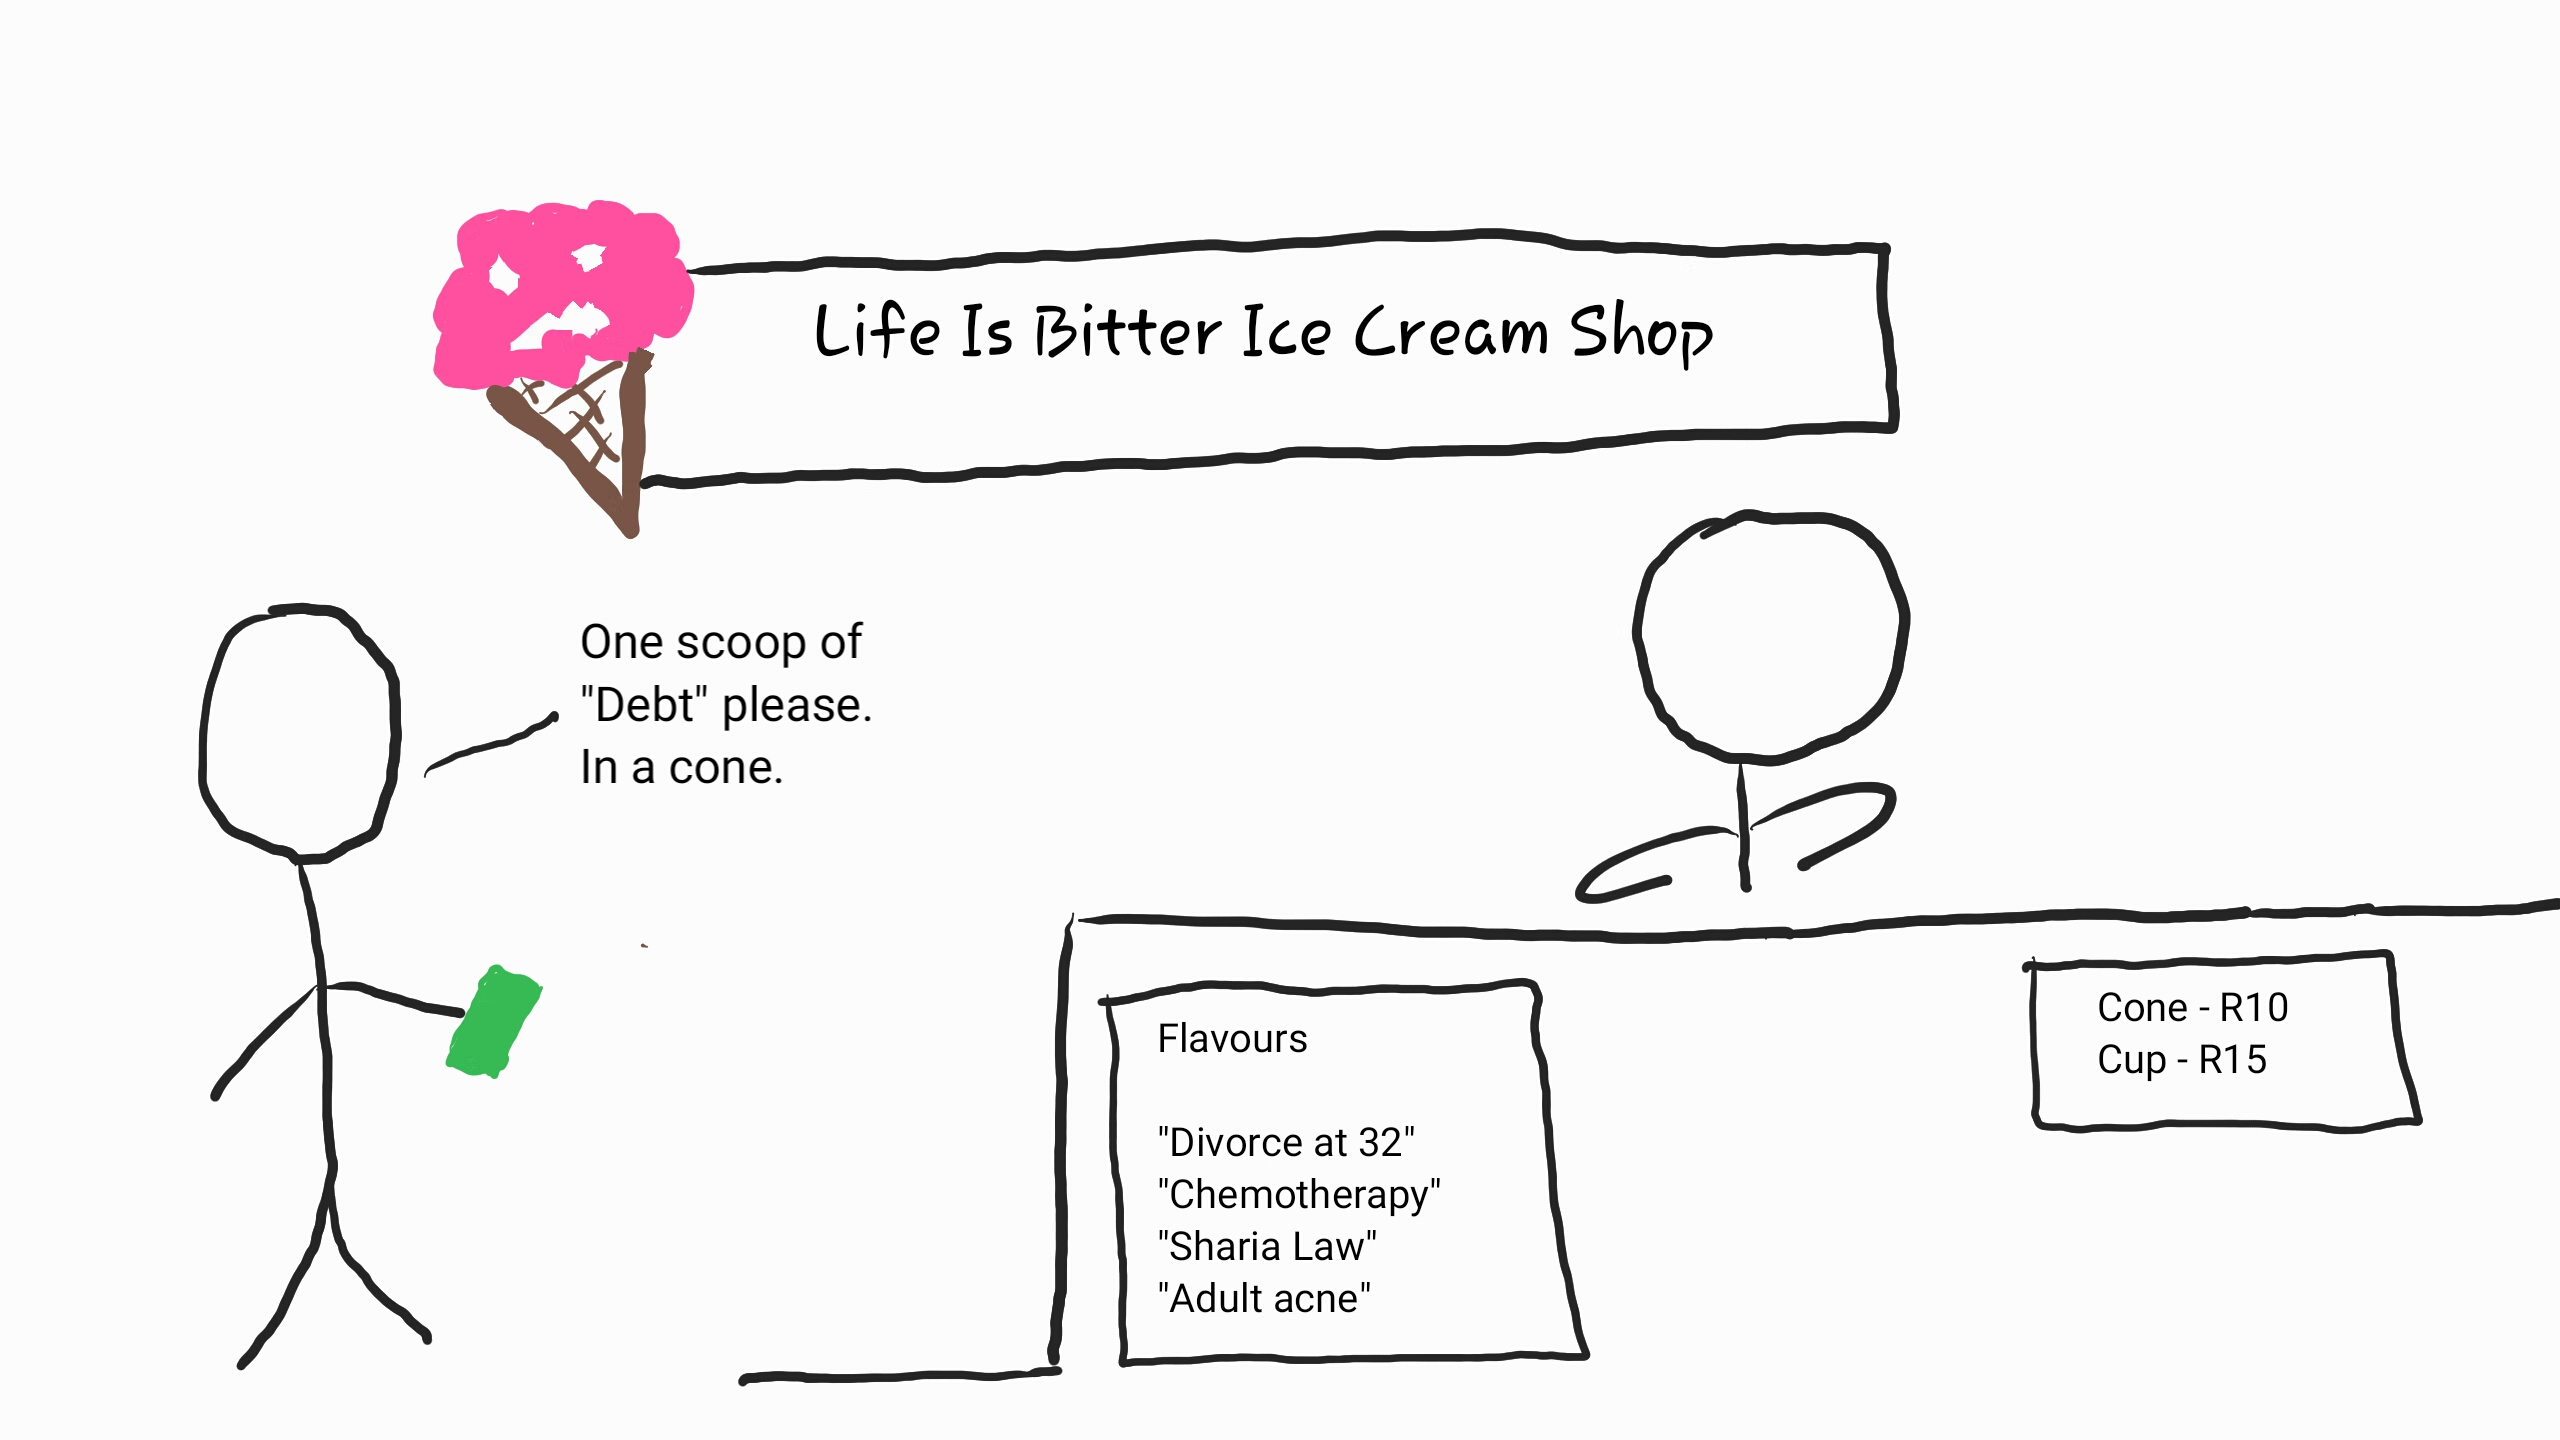 Lifebittericecreamshop_0